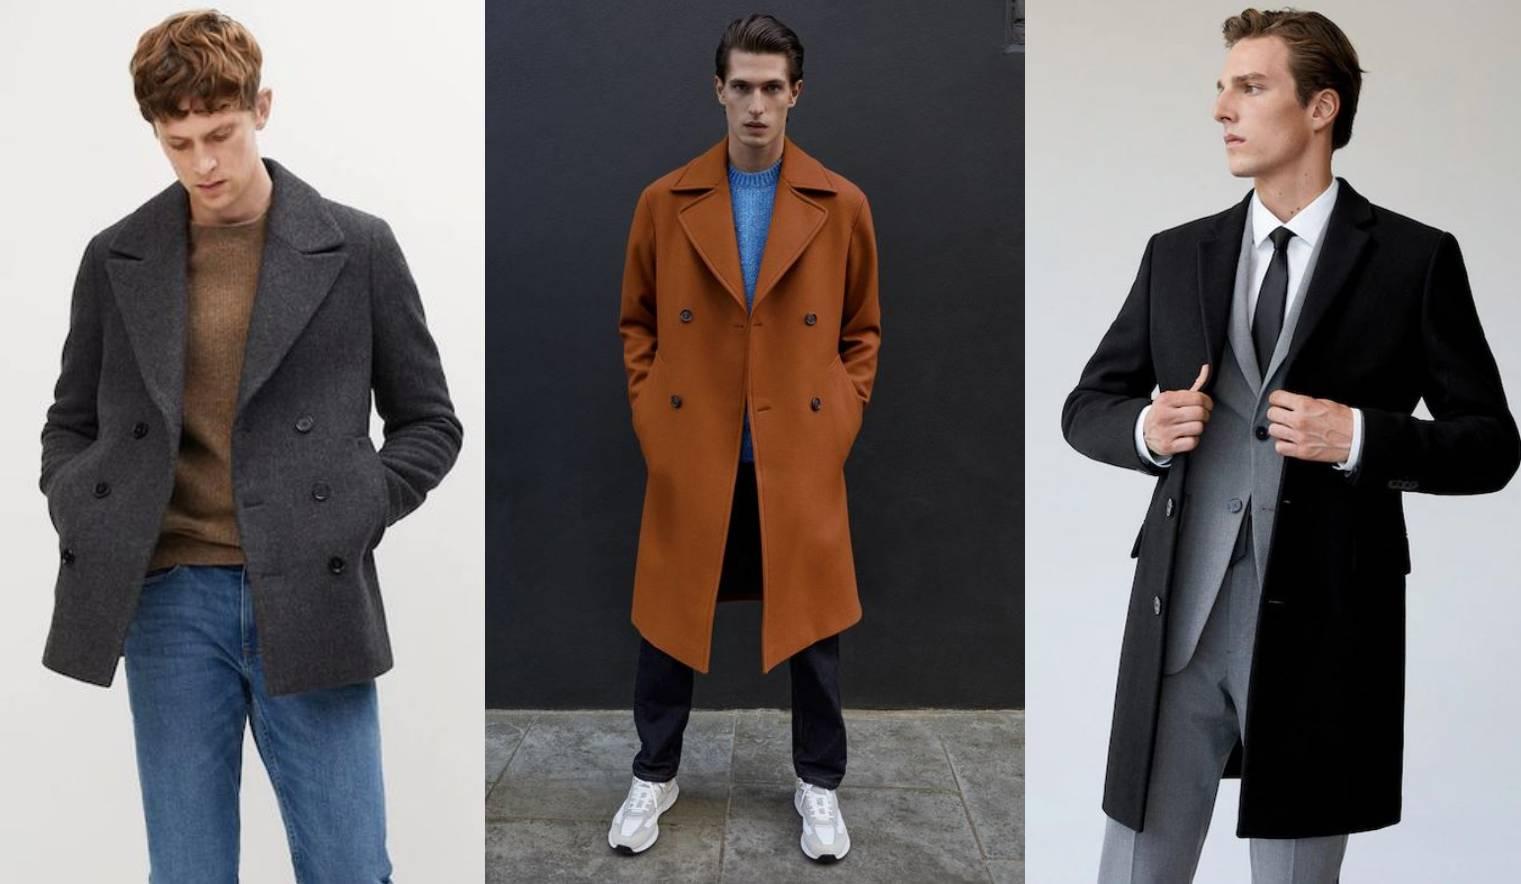 Muški kaputi u deset klasičnih varijanti: Od crne do čokoladne